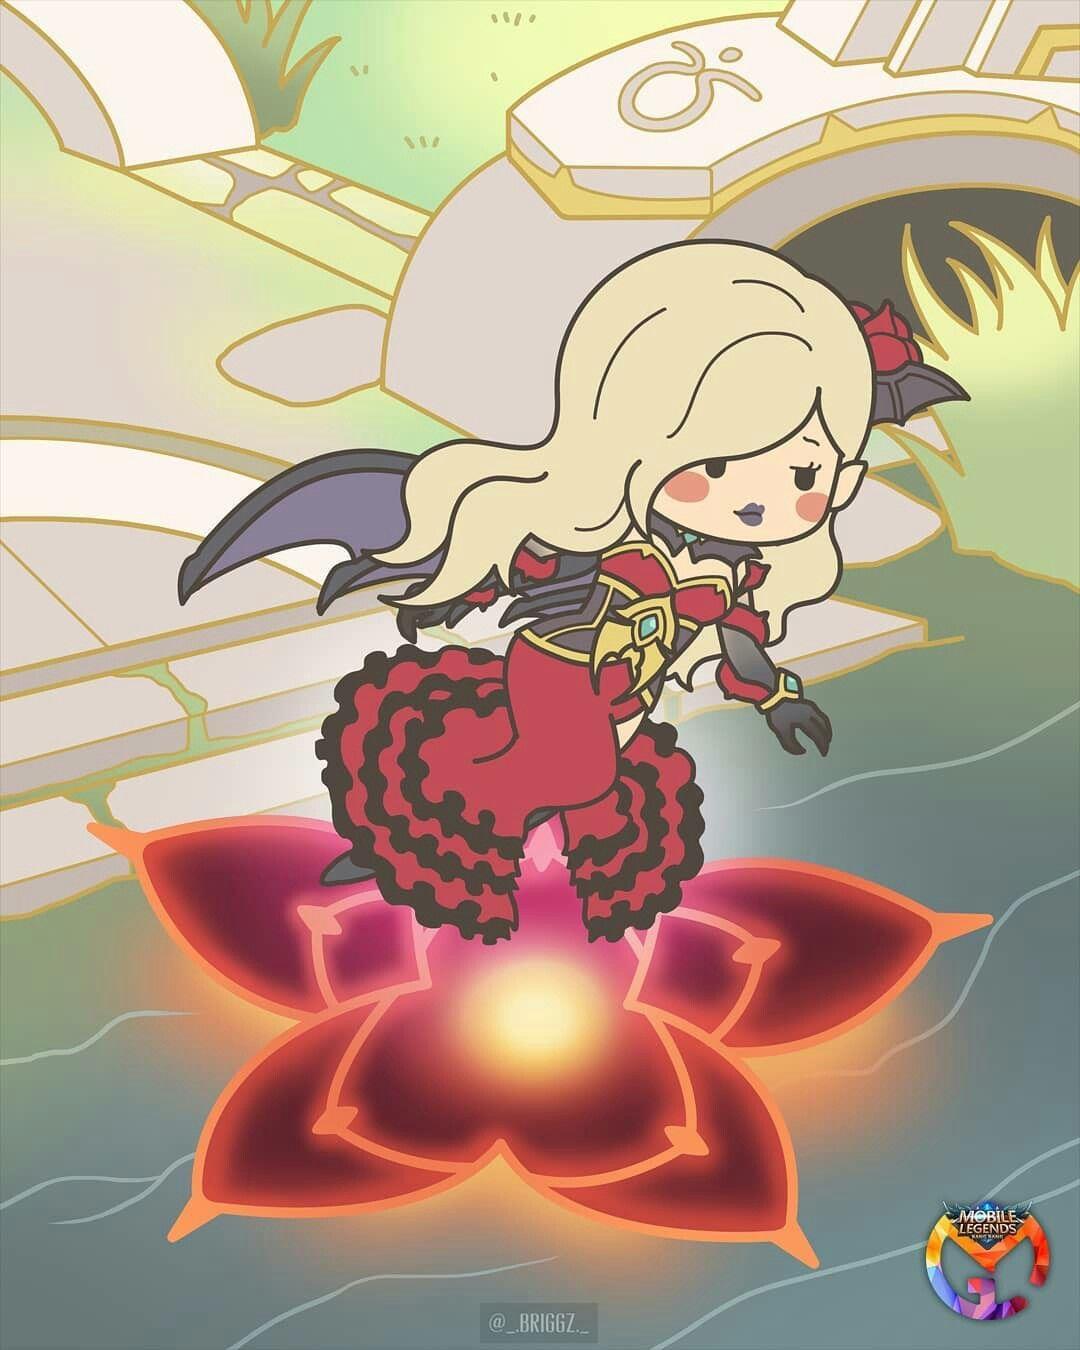 Carmilla Mlbb Mobile Legends In 2020 Mobile Legends Mobile Legend Wallpaper Anime